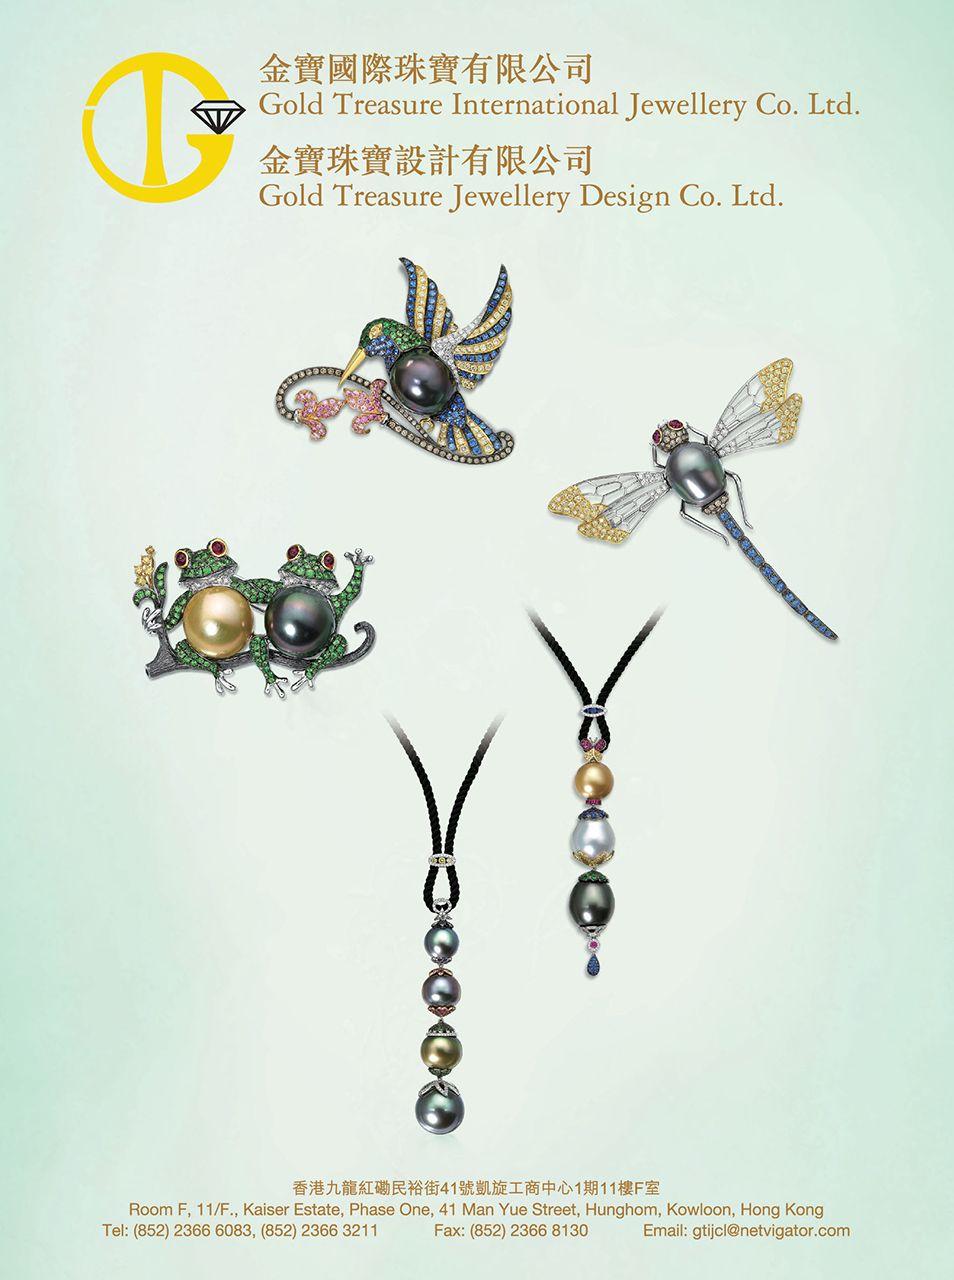 Gold Treasure International Jewellery Co Ltd HKJE Magazine